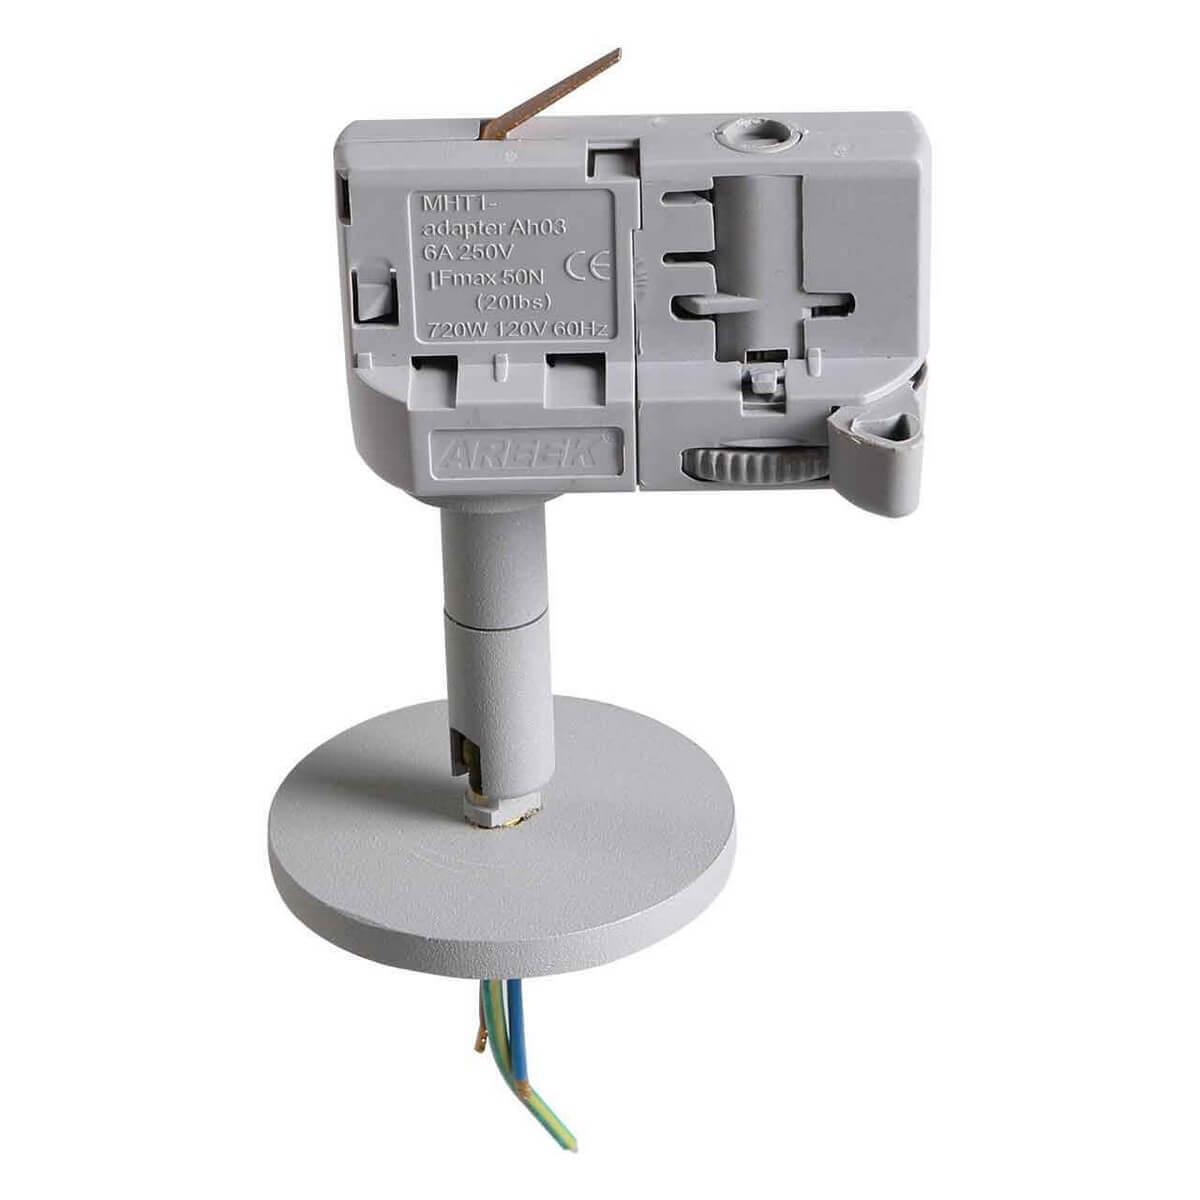 Адаптер для шинопровода Lightstar 594059 Asta Gray (для трехфазного шинопровода)